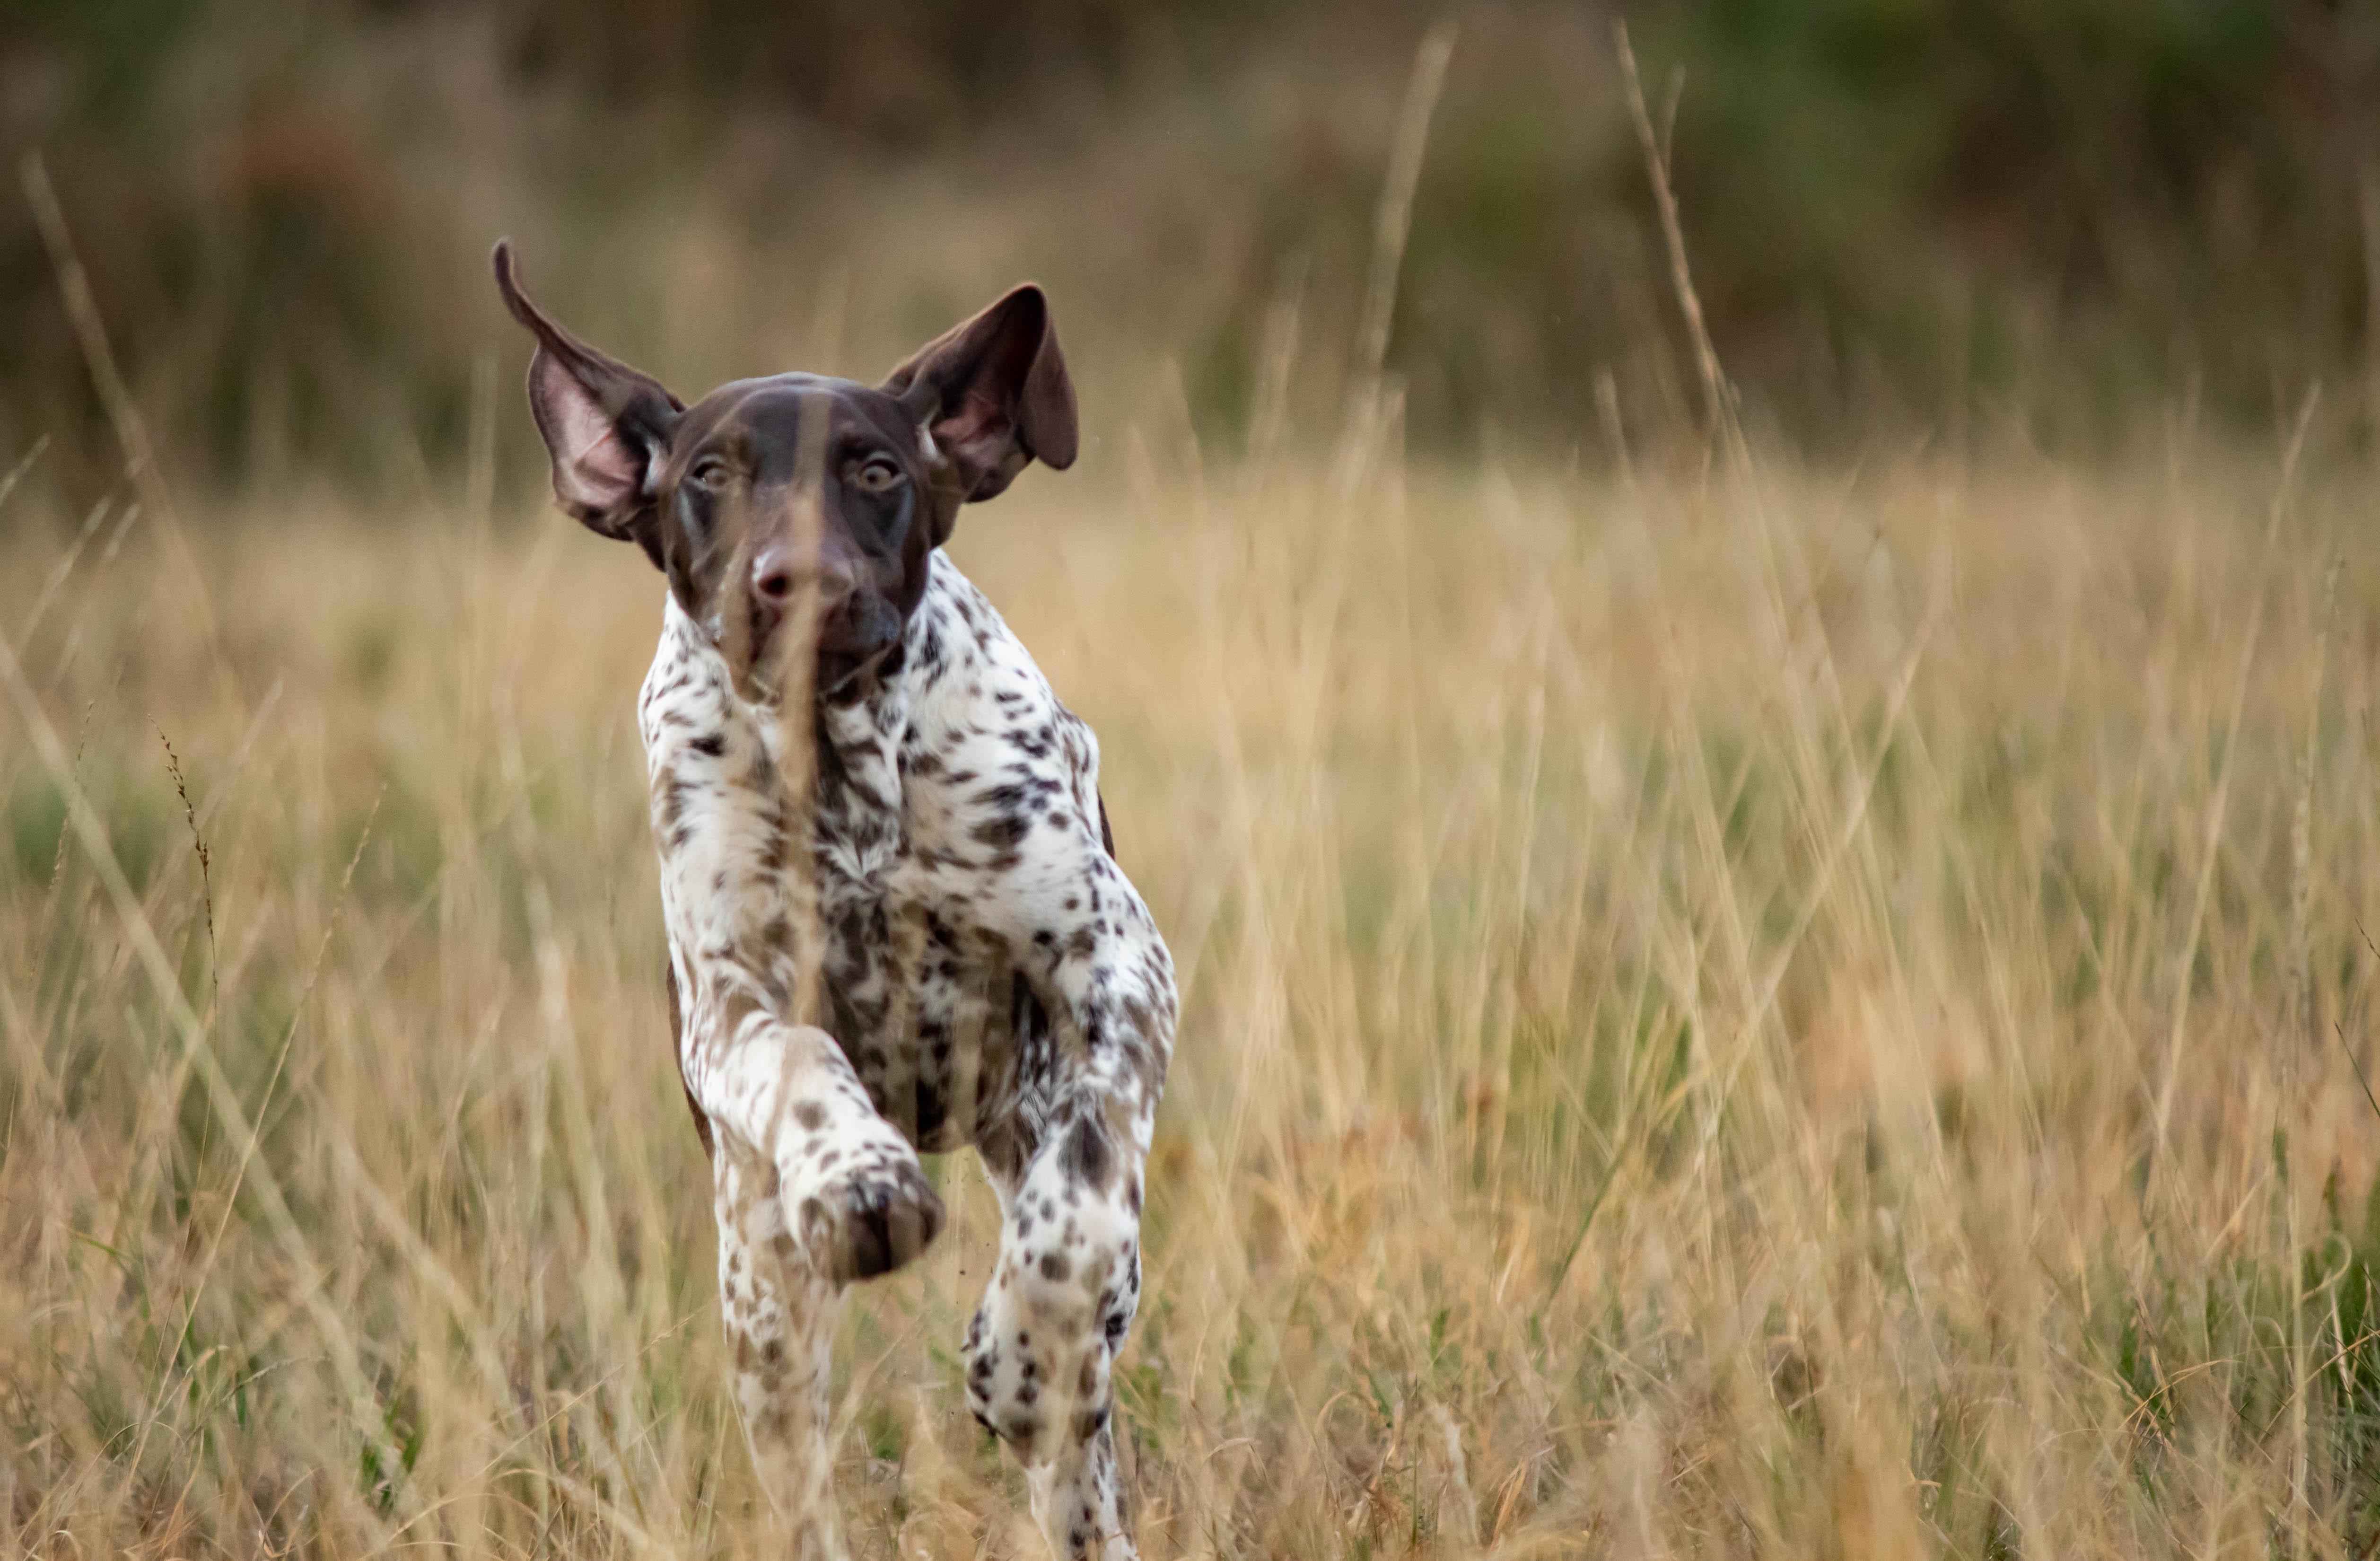 Pension canine à Mios en Gironde